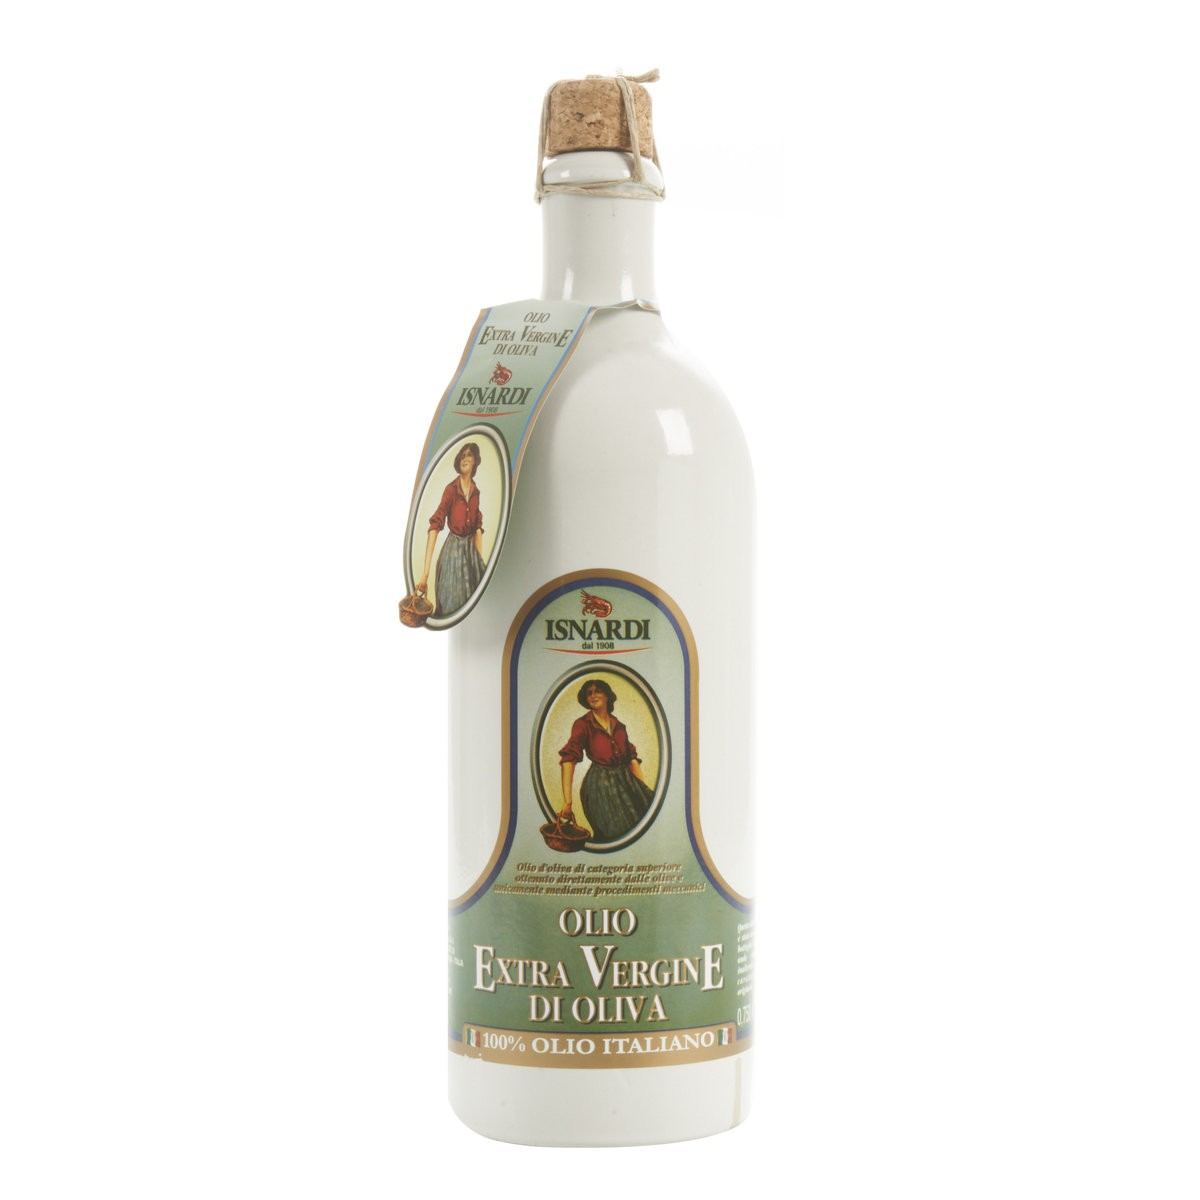 Isnardi Olio extravergine d'oliva